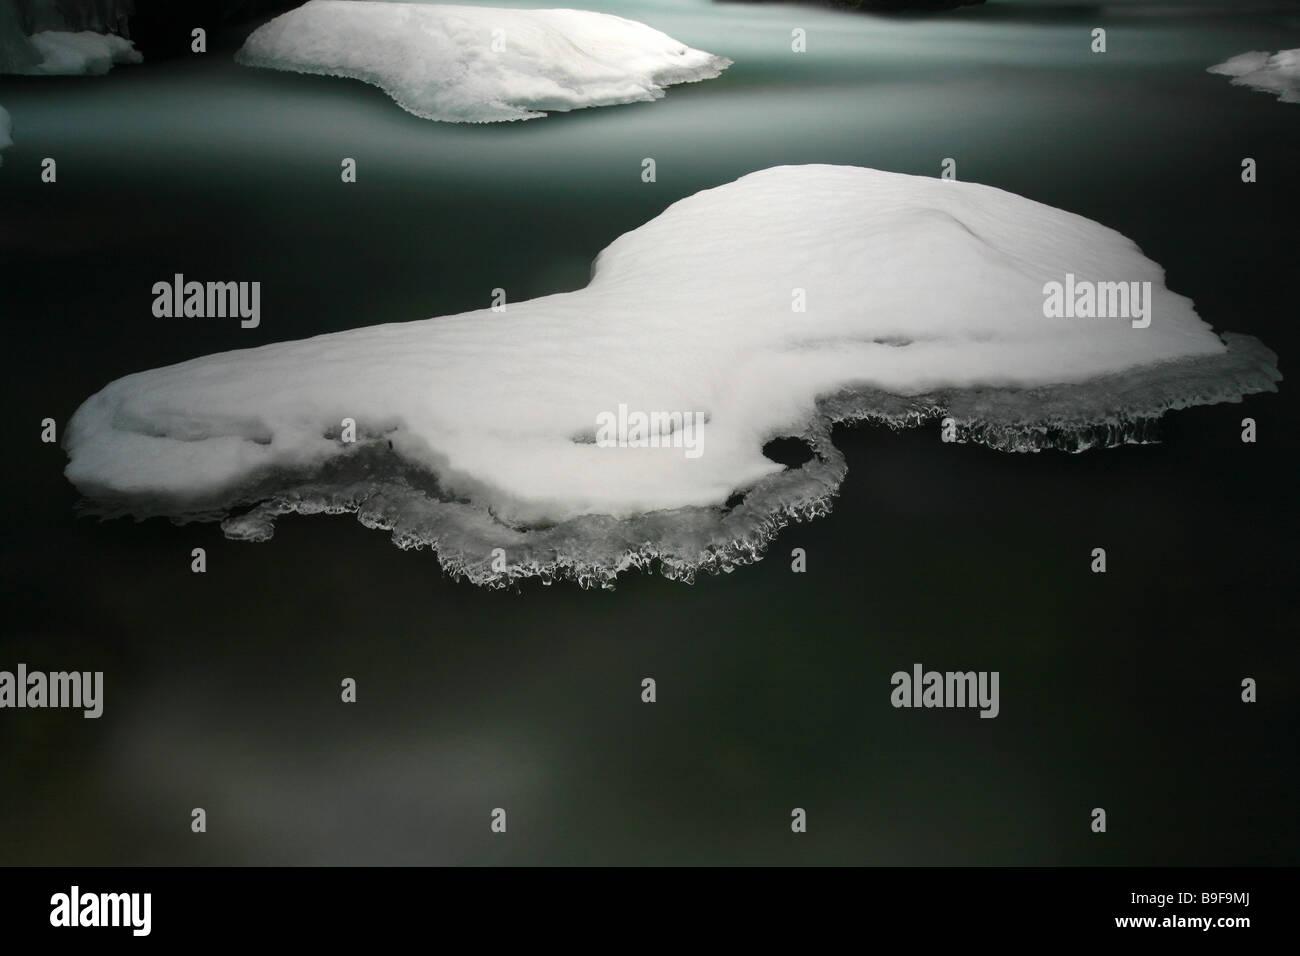 Snow and ice over rocks in Rauma river in Romsdalen valley, Rauma kommune, Møre og Romsdal, Norway. - Stock Image